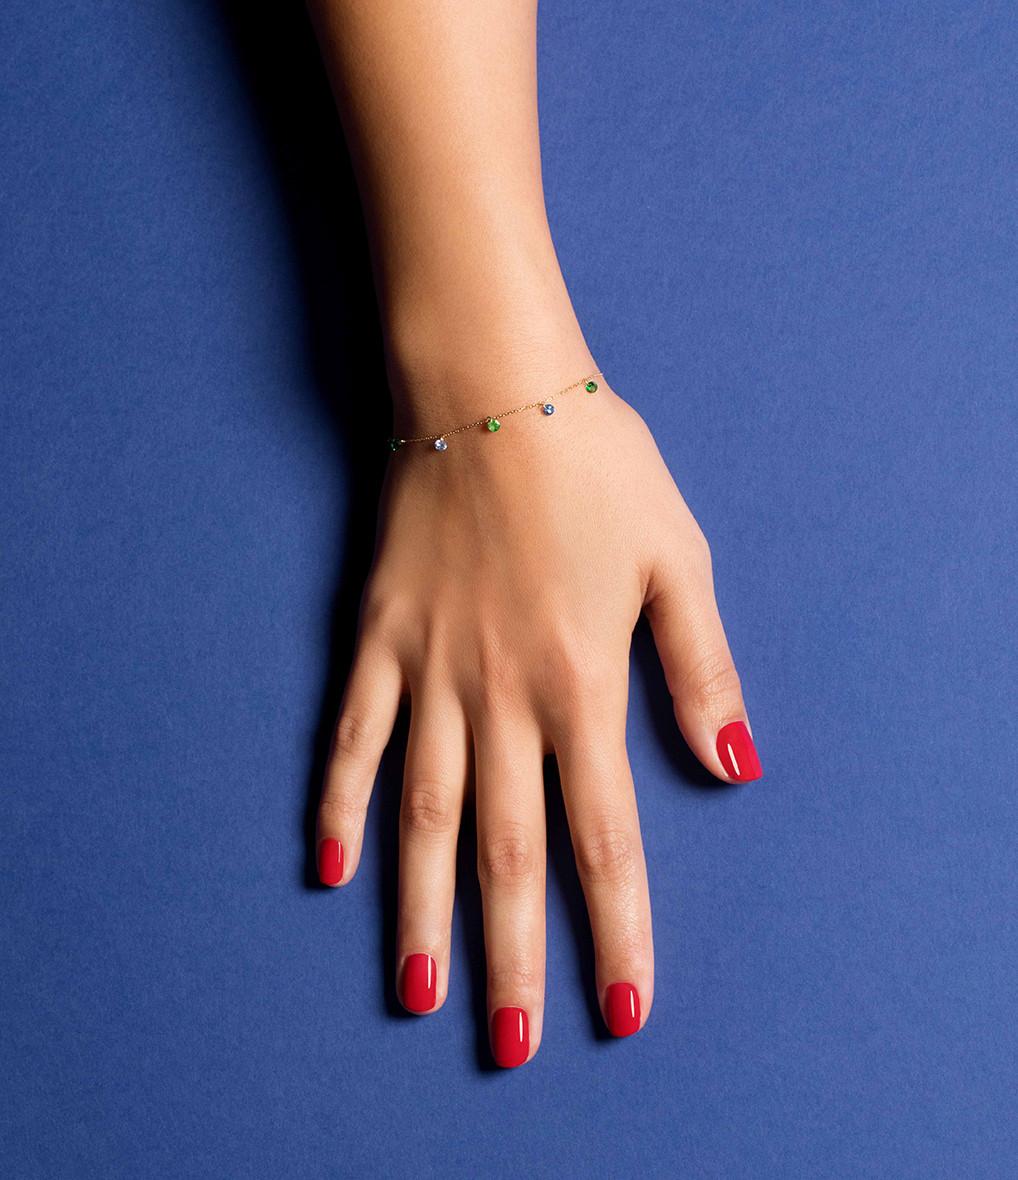 LA BRUNE & LA BLONDE - Bracelet Confetti 7 Rio Saphirs Bleus Tsavorites Or Jaune